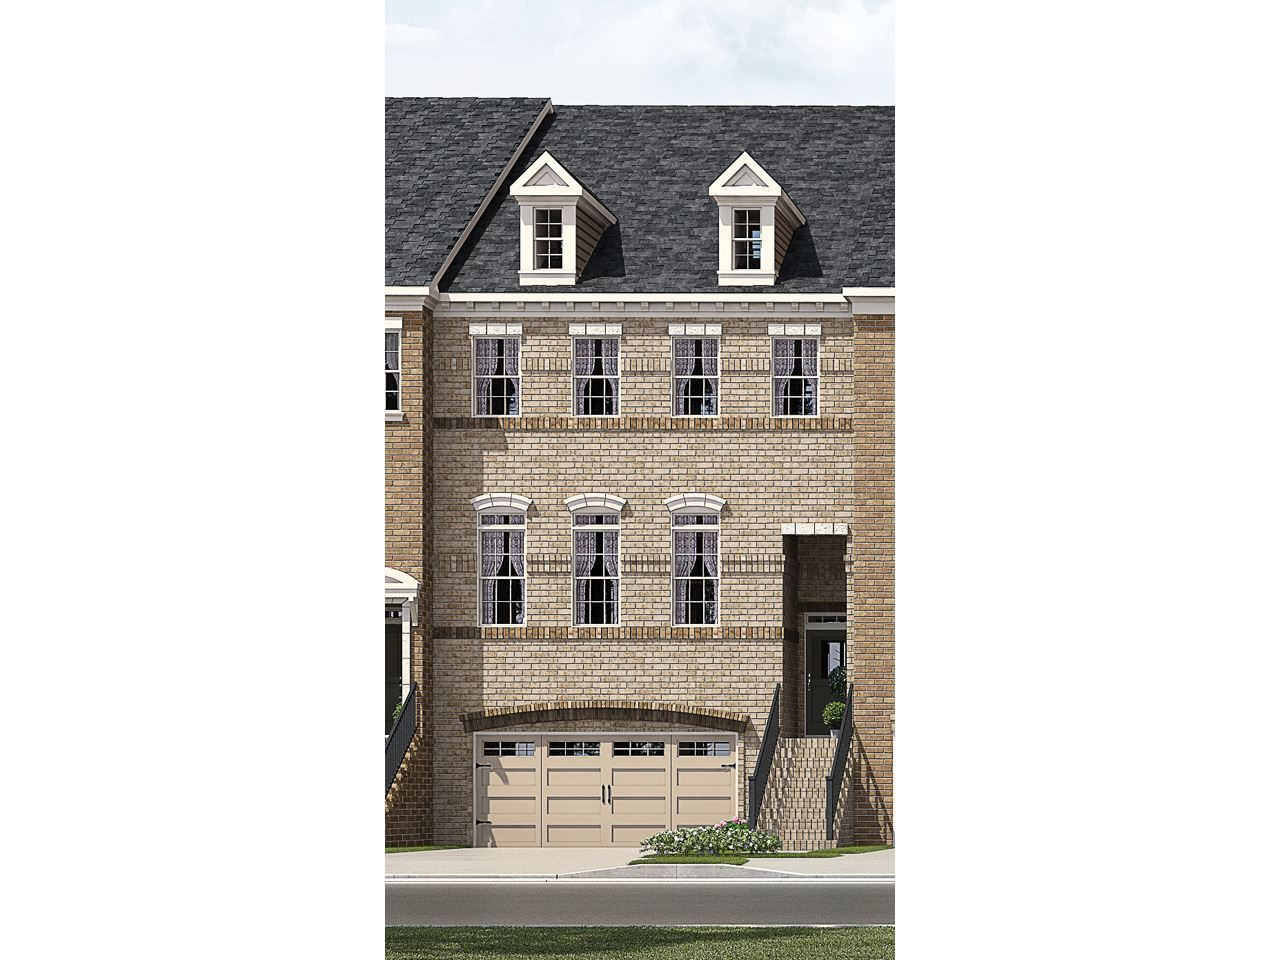 2770 AVINGTON LANE, Vinings, GA Homes & Land - Real Estate